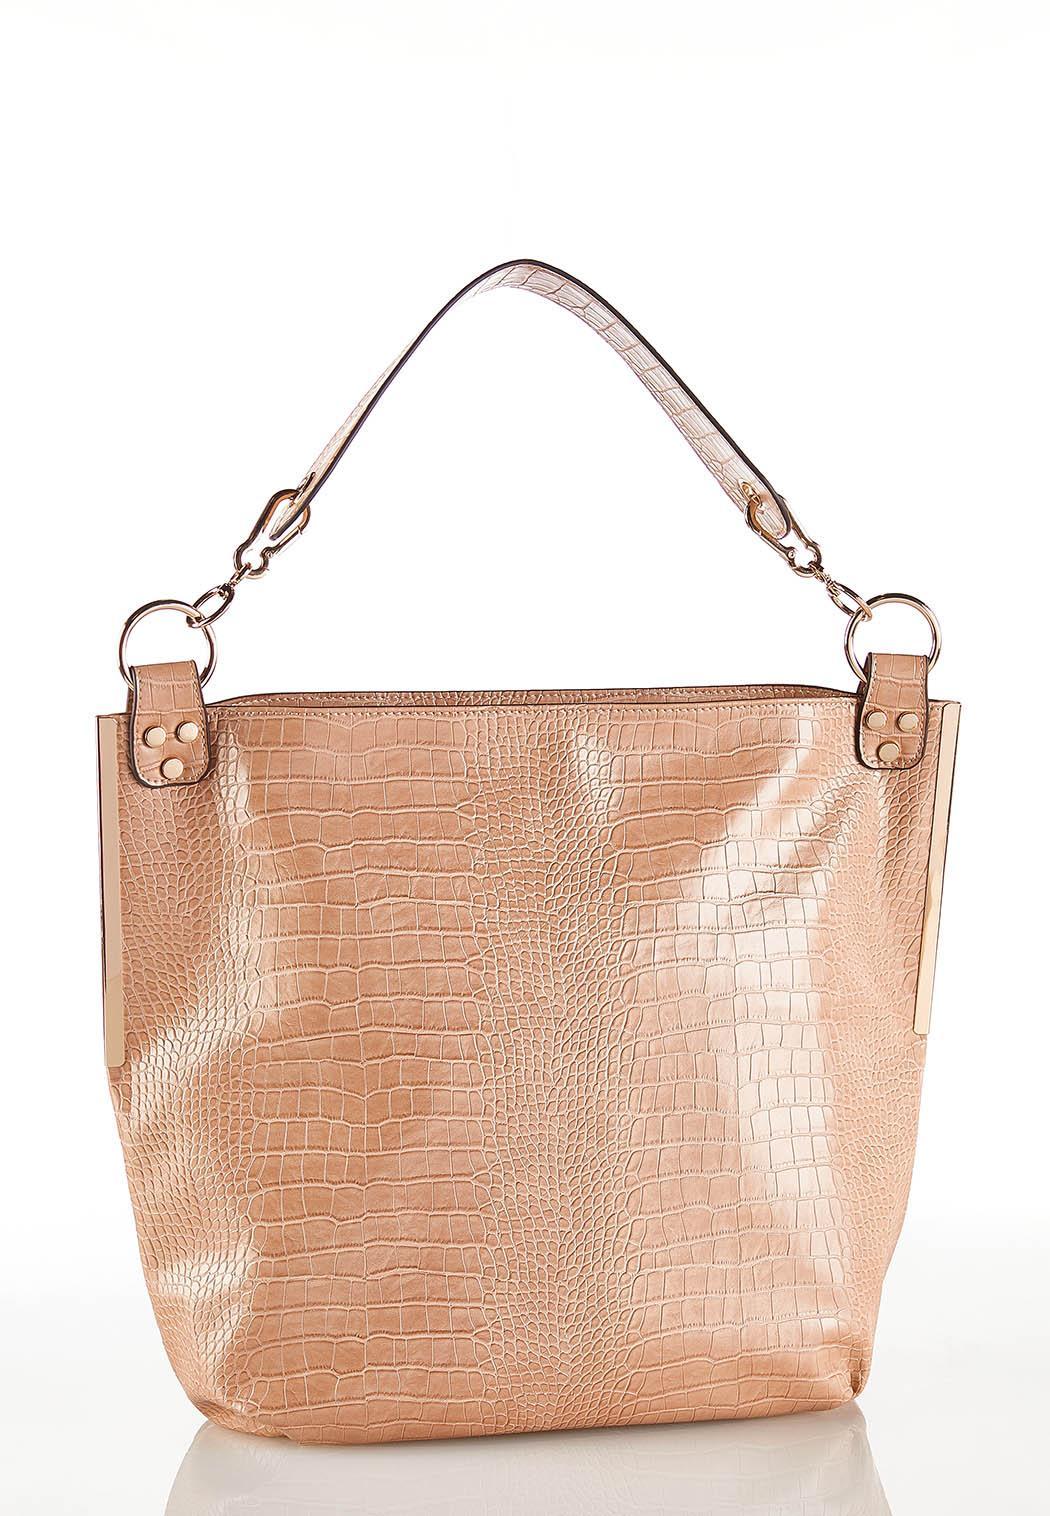 Croc Hobo Handbag